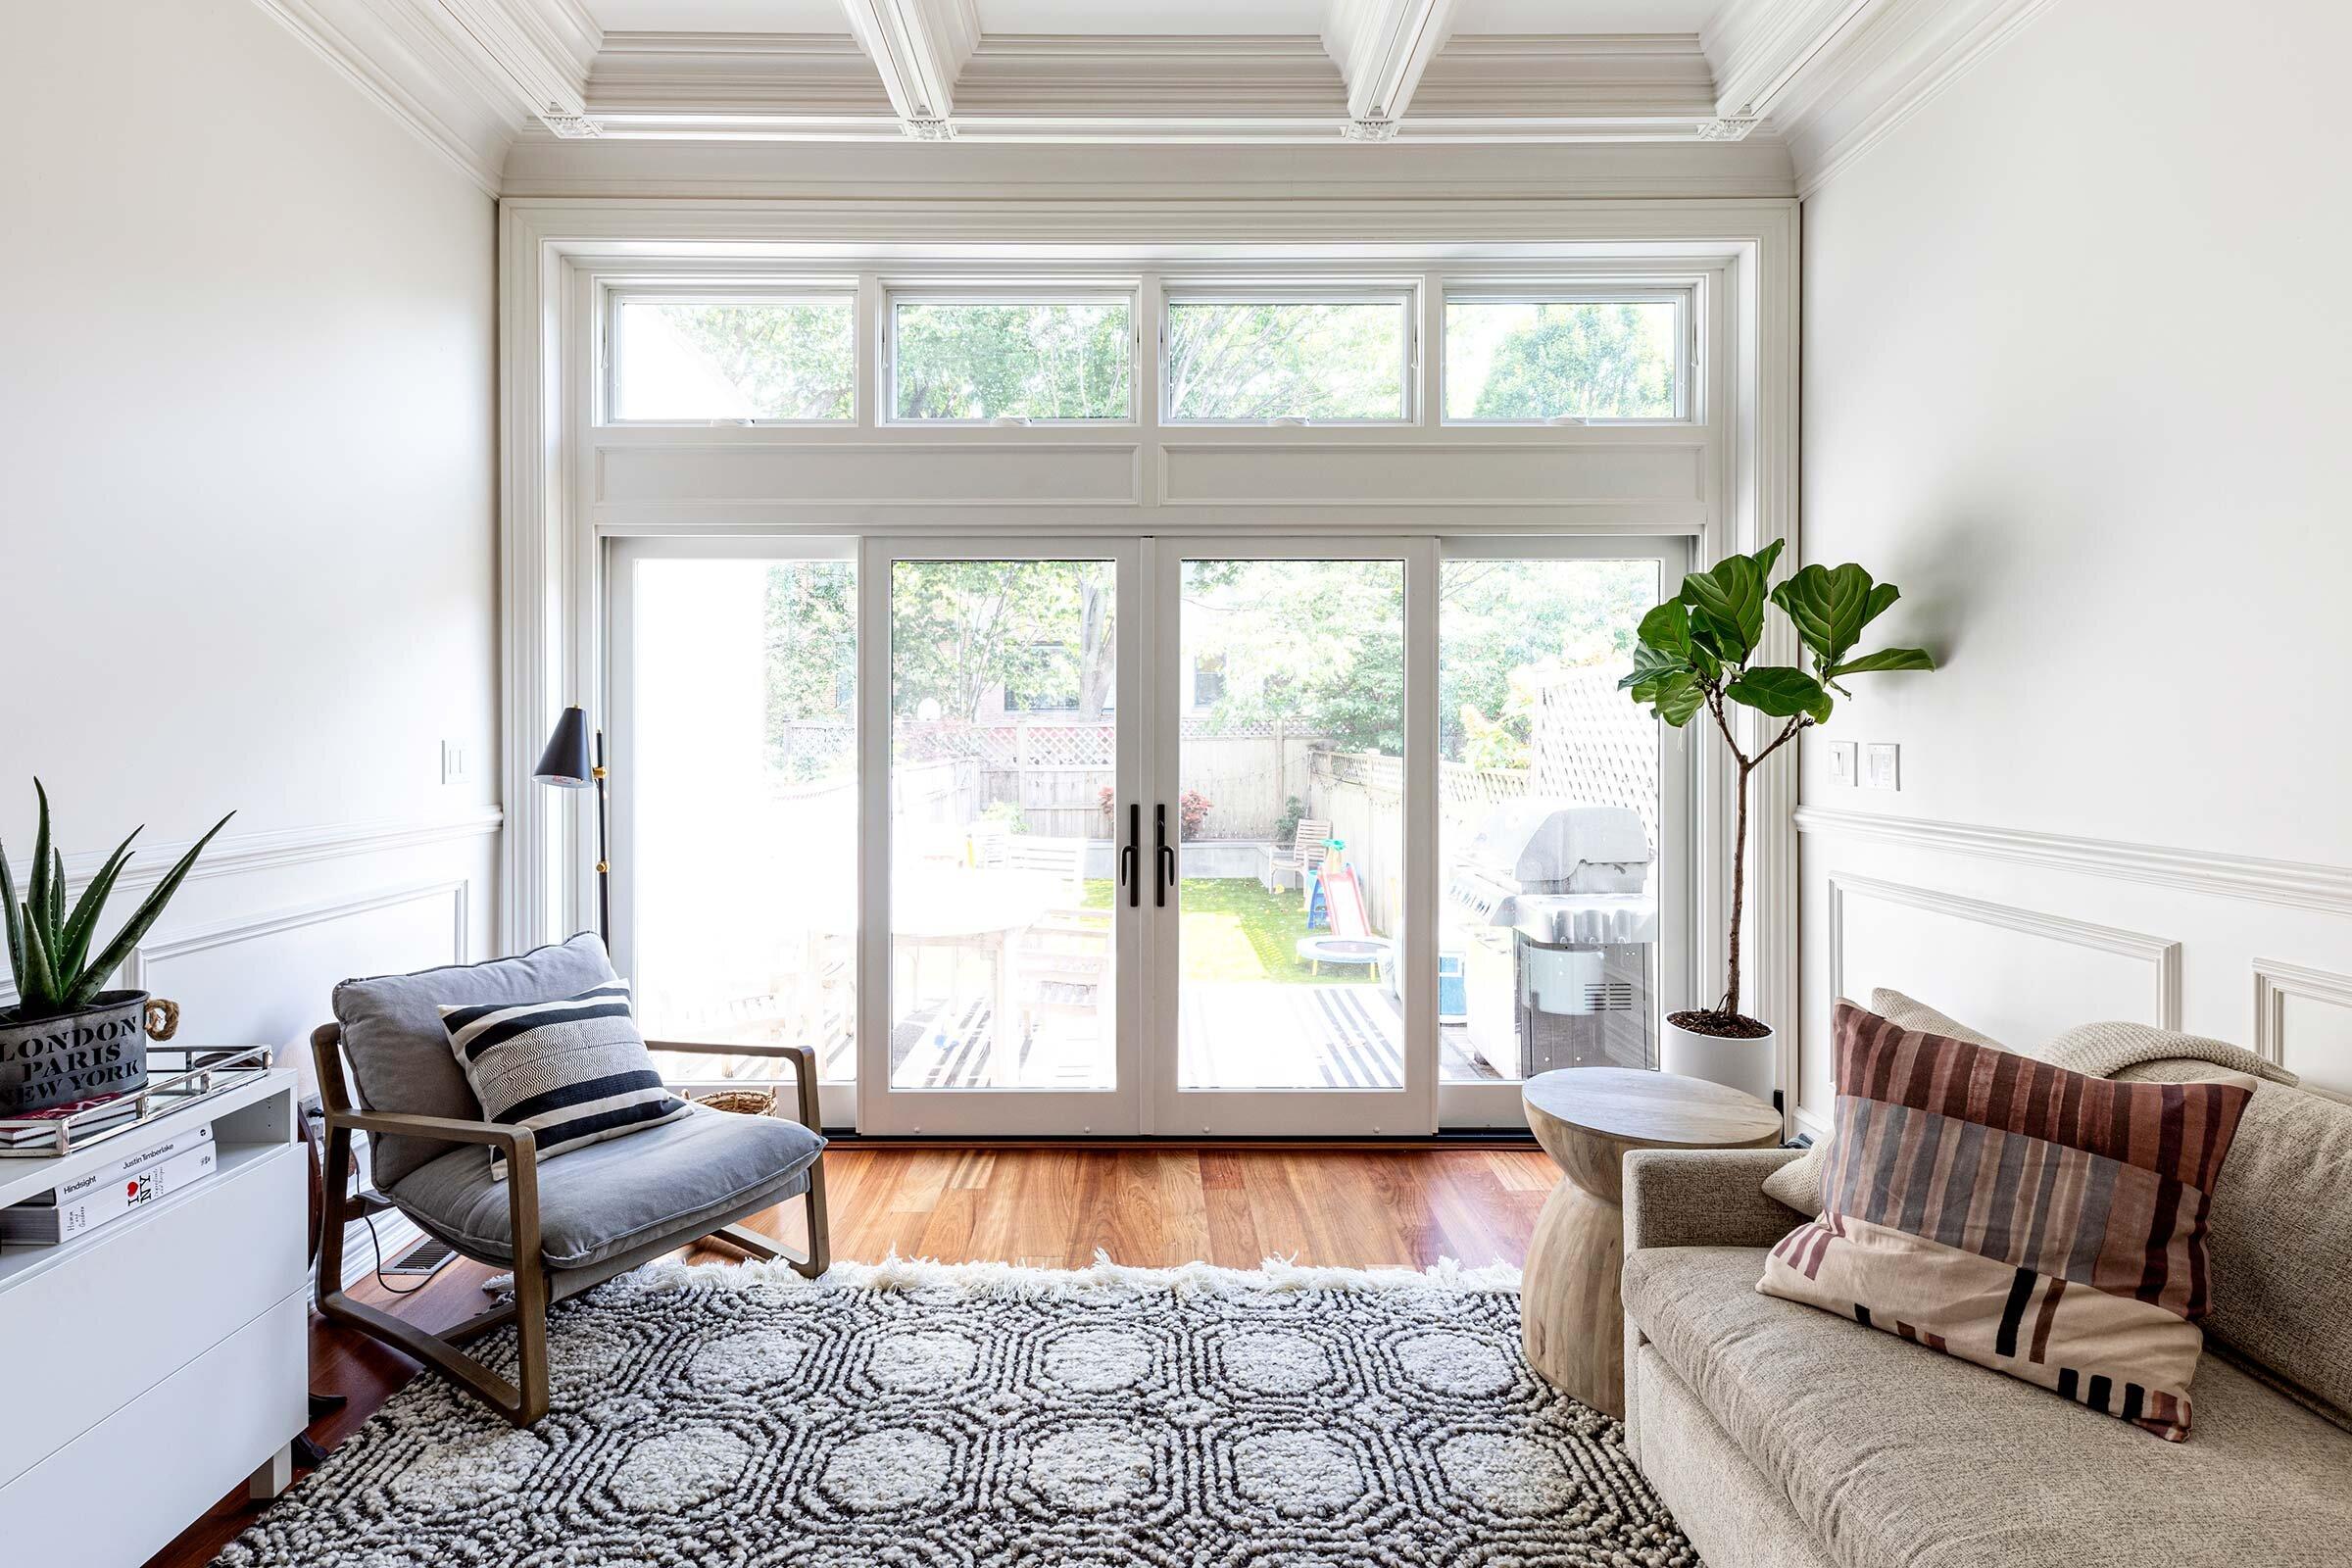 thompson-home-renovations-contractor-window-trim-millwork-backyard.jpg